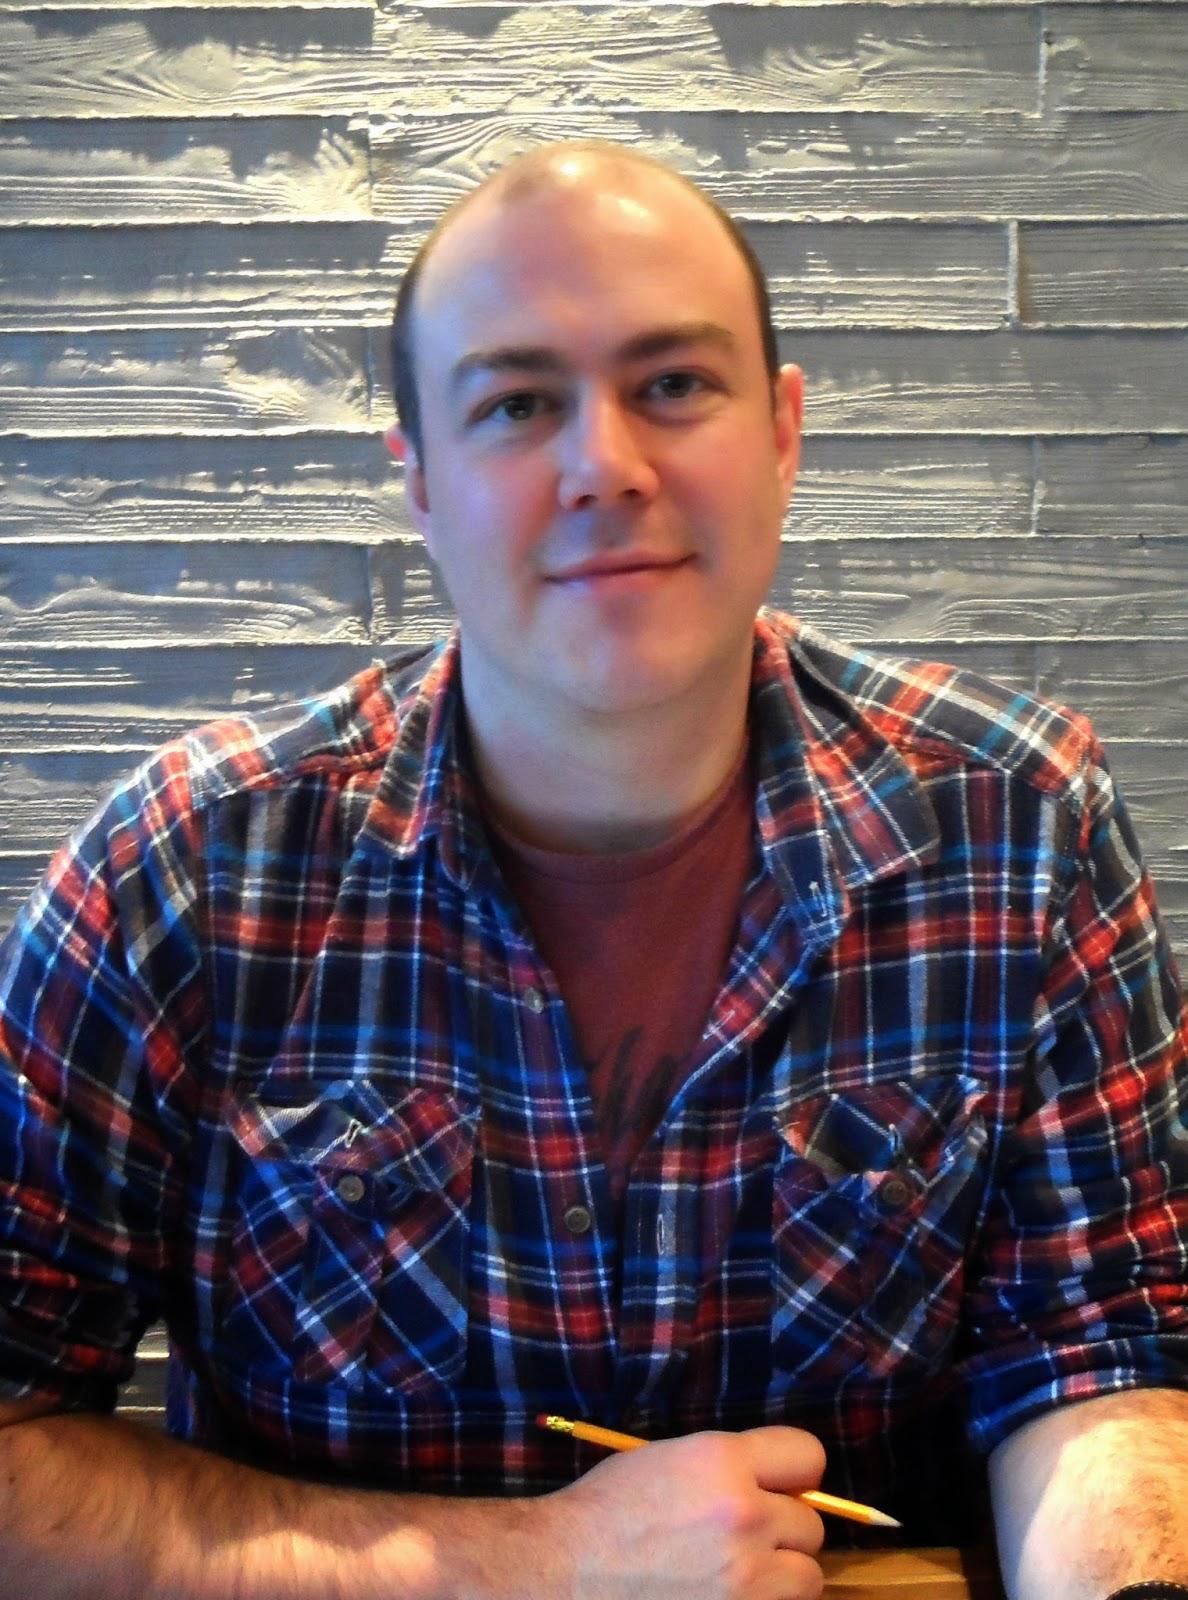 Daniel Deacon: freelance proofreader and copy editor